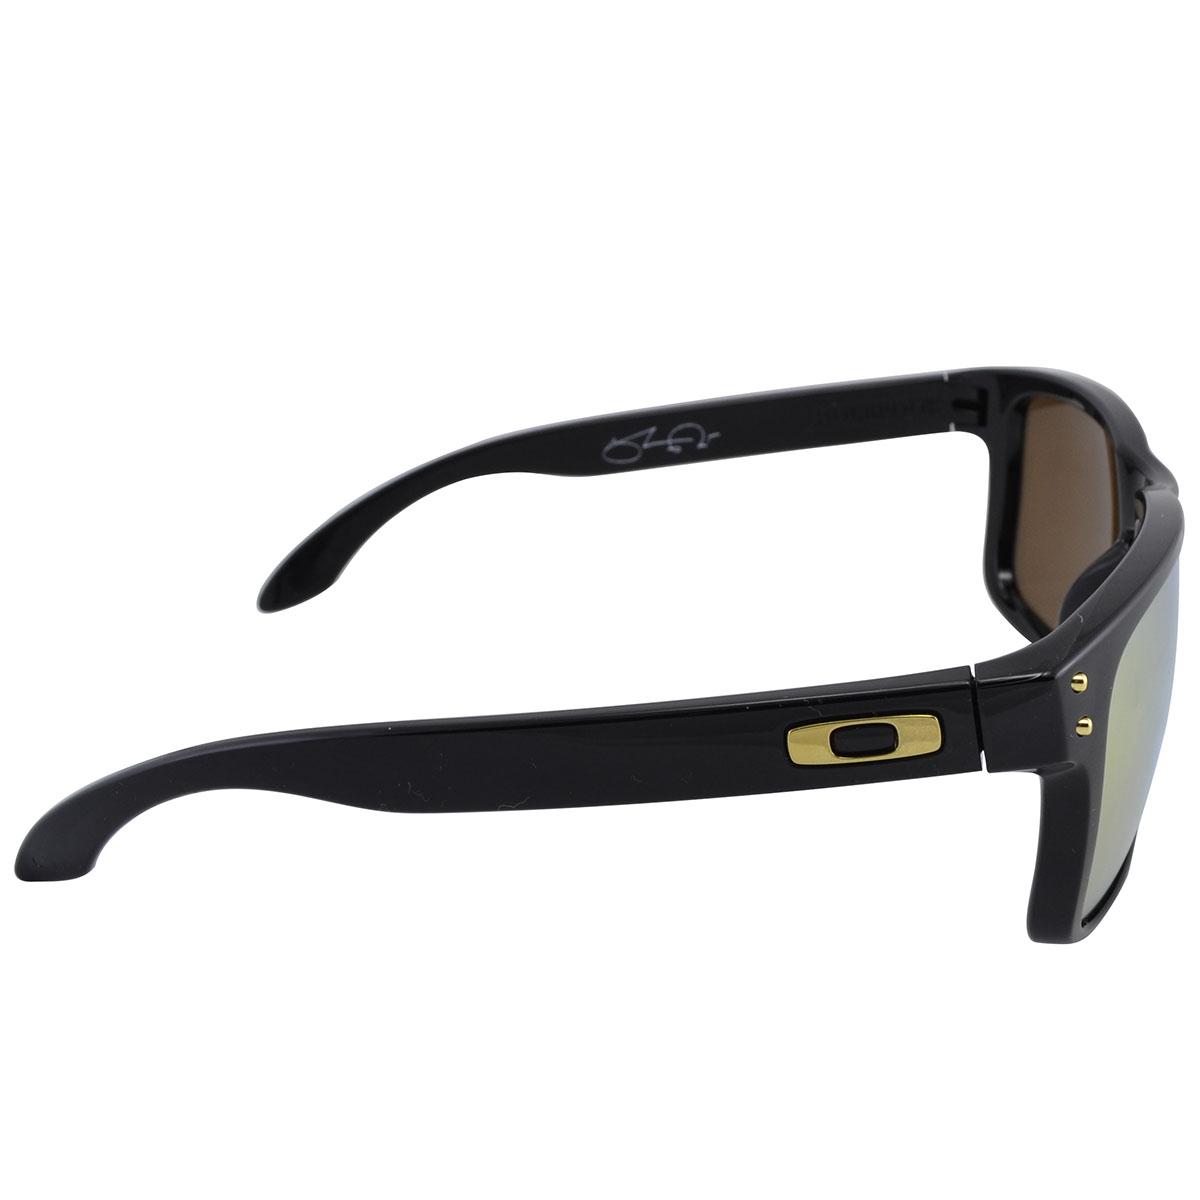 826040adcc58f Óculos Oakley Holbrook Shaun White Gold Signature Polished Black Lente 24k  Iridium ref OO9102-